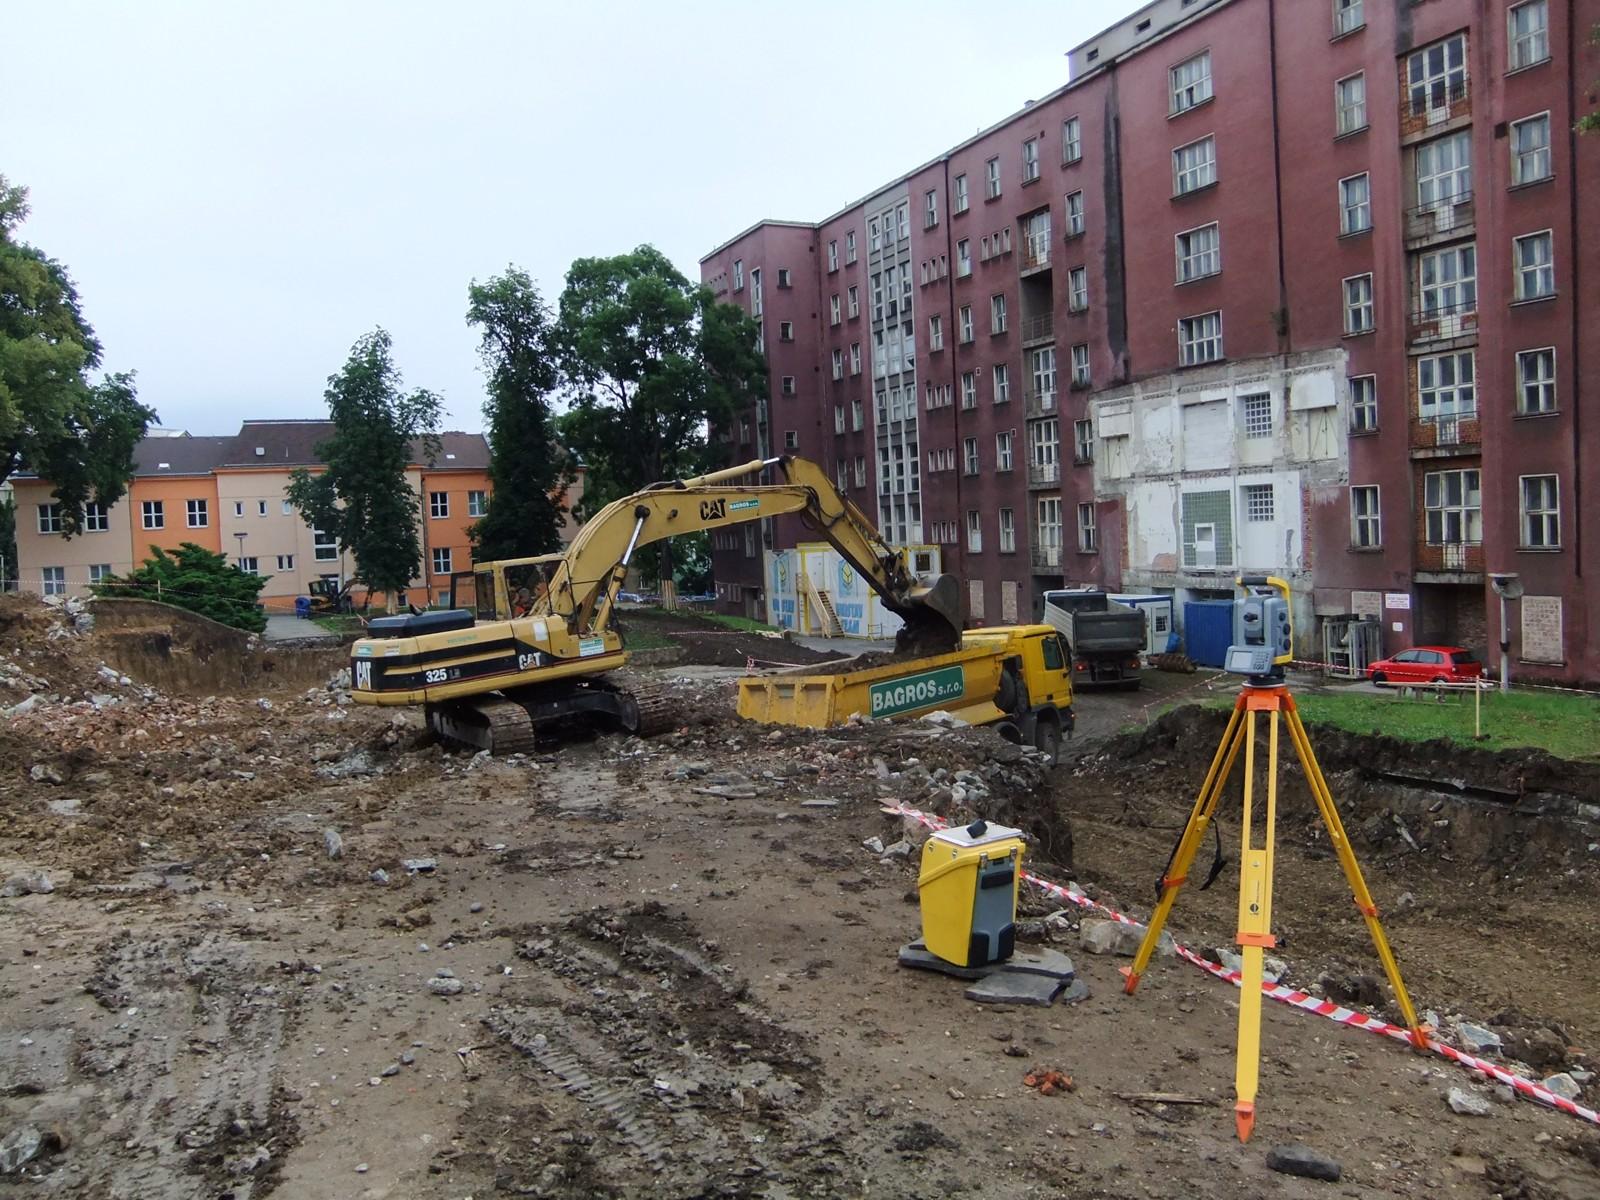 areál Kampusu UJEP v Ústí nad Labem 04-07-2011